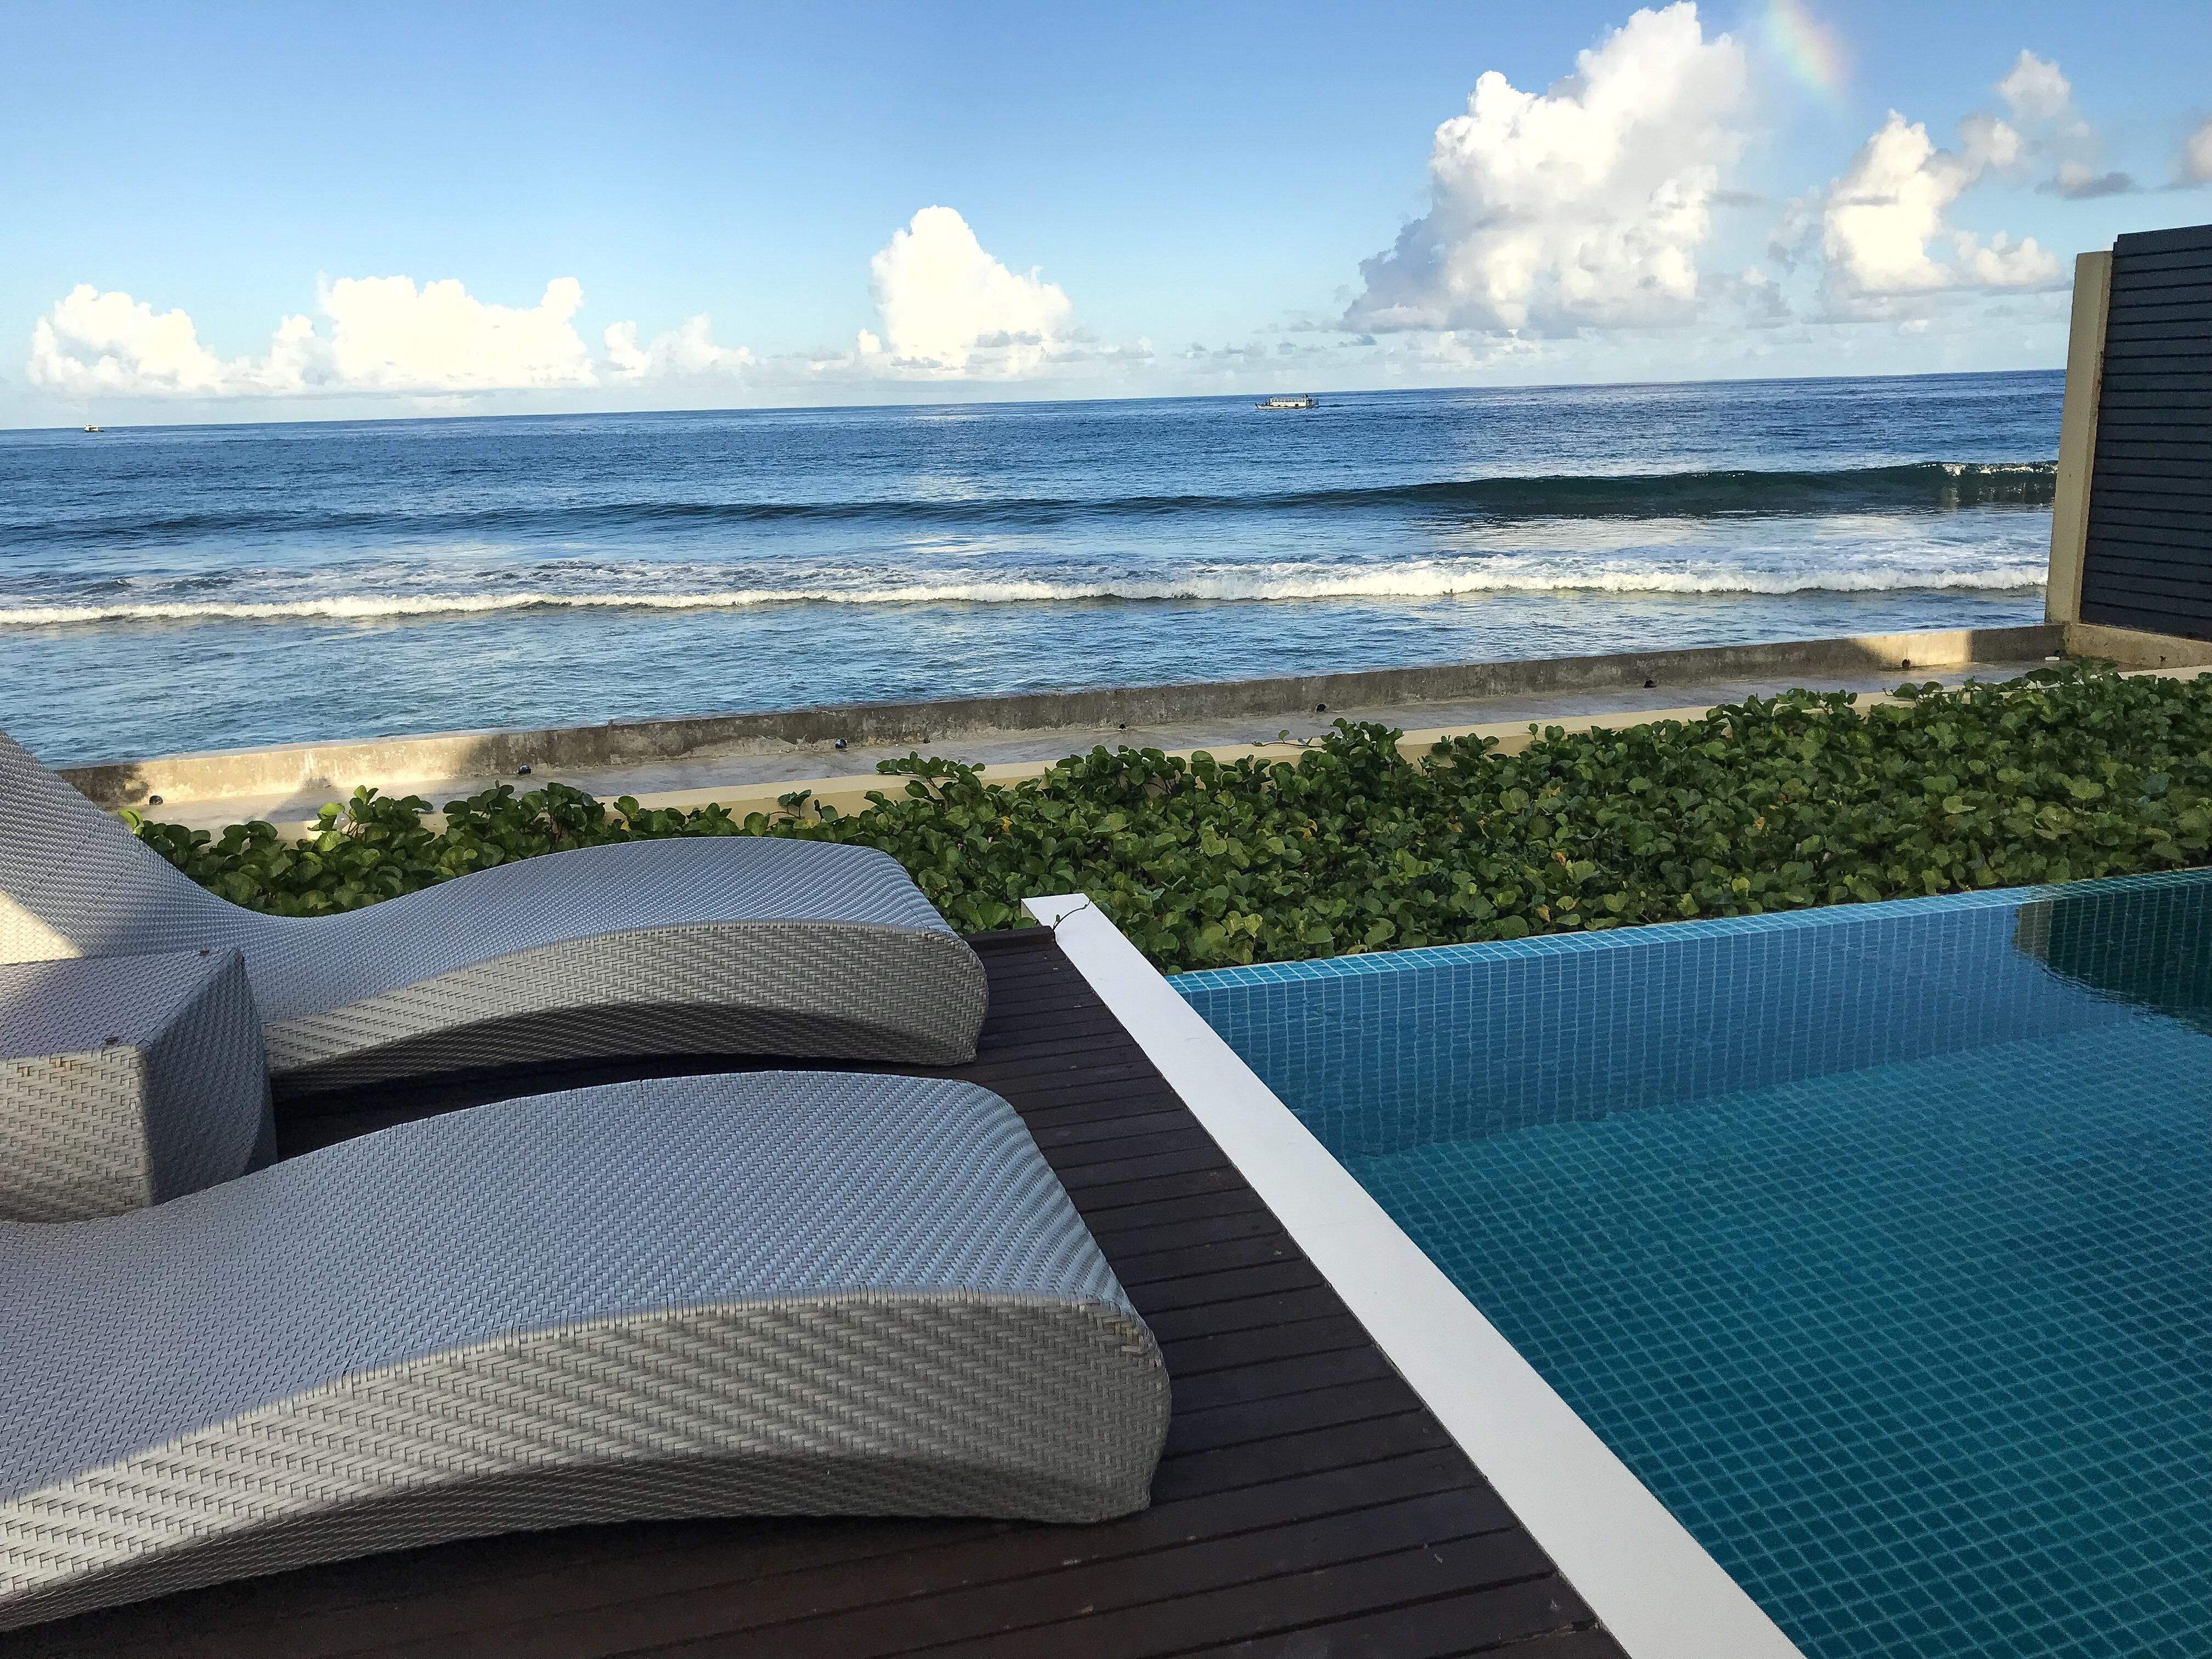 Ocean Pool Villa View